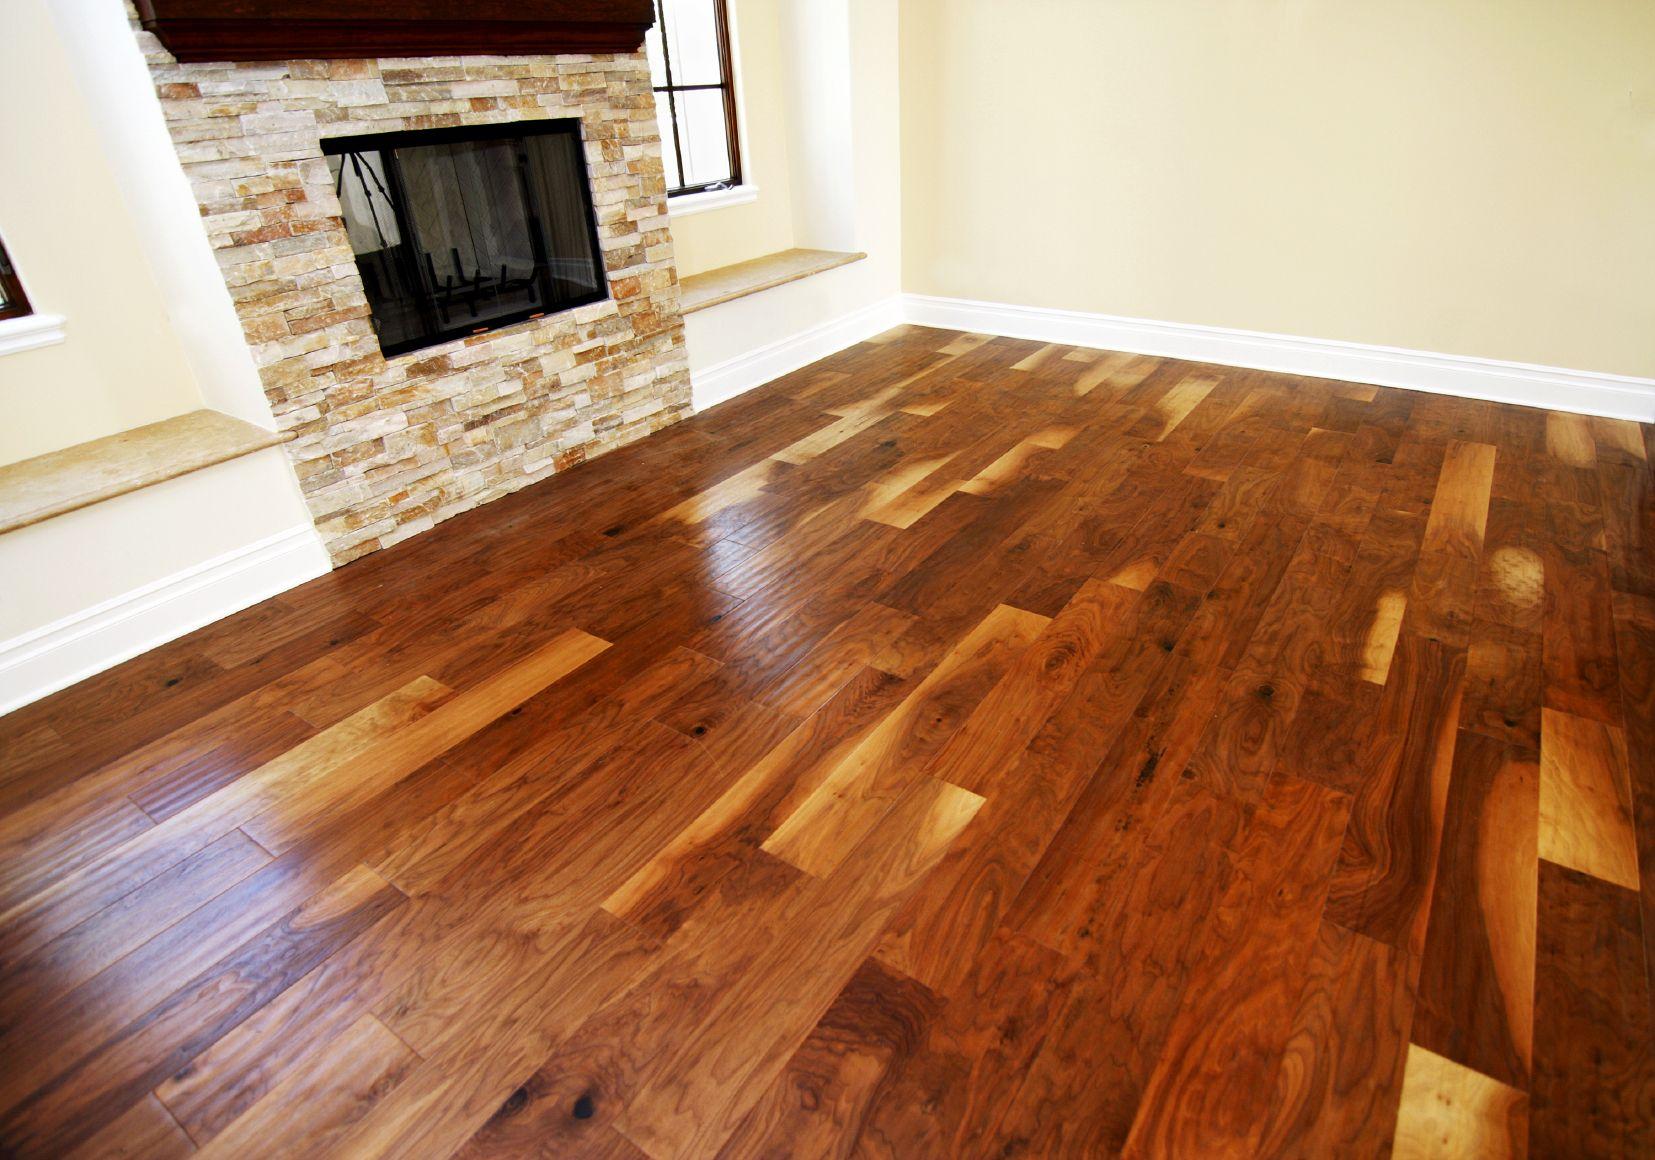 Solid Hardwood Flooring Installing Hardwood Floors Hardwood Floors Engineered Wood Floors